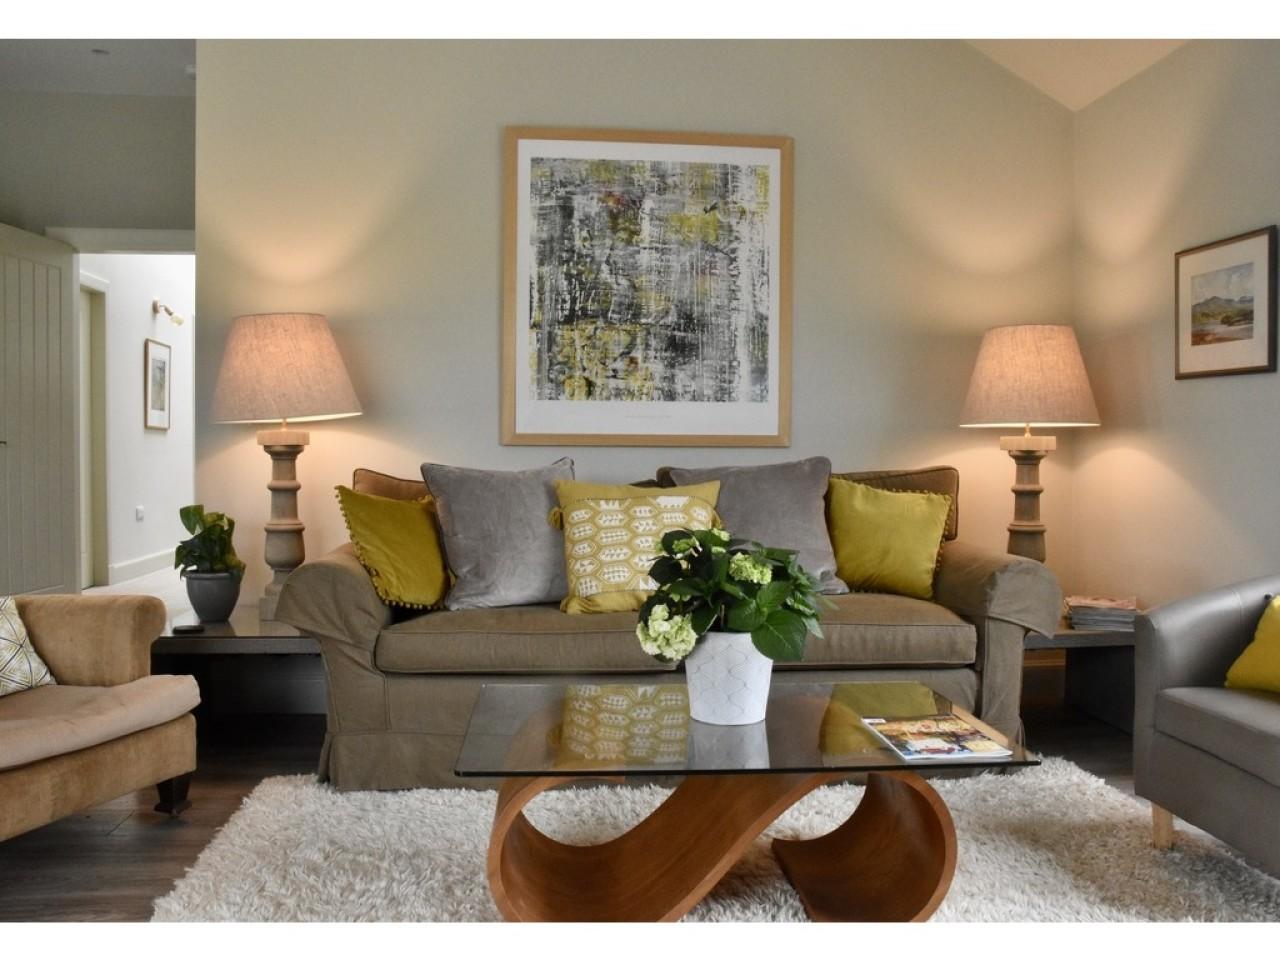 Living Room Lights on